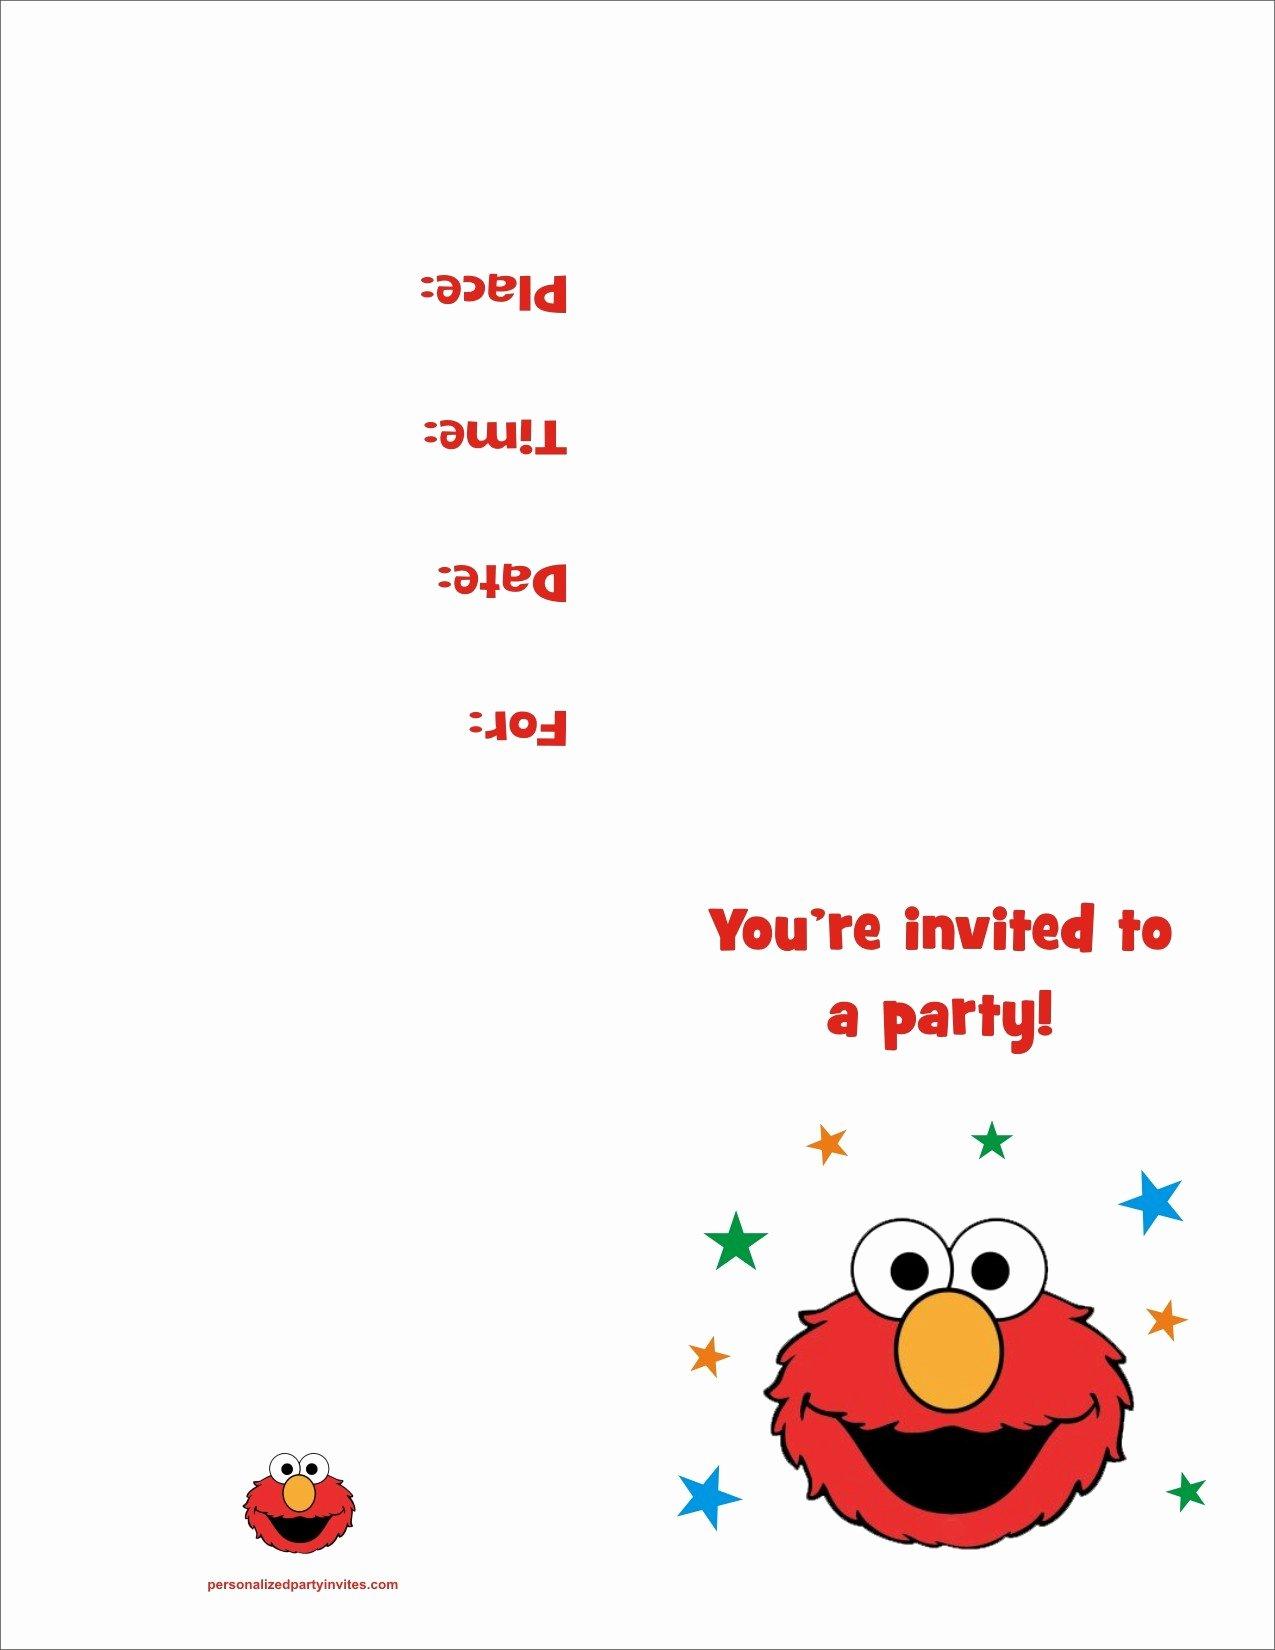 Free Printable Anniversary Invitations Fresh Elmo Free Printable Birthday Party Invitation Personalized Party Invites